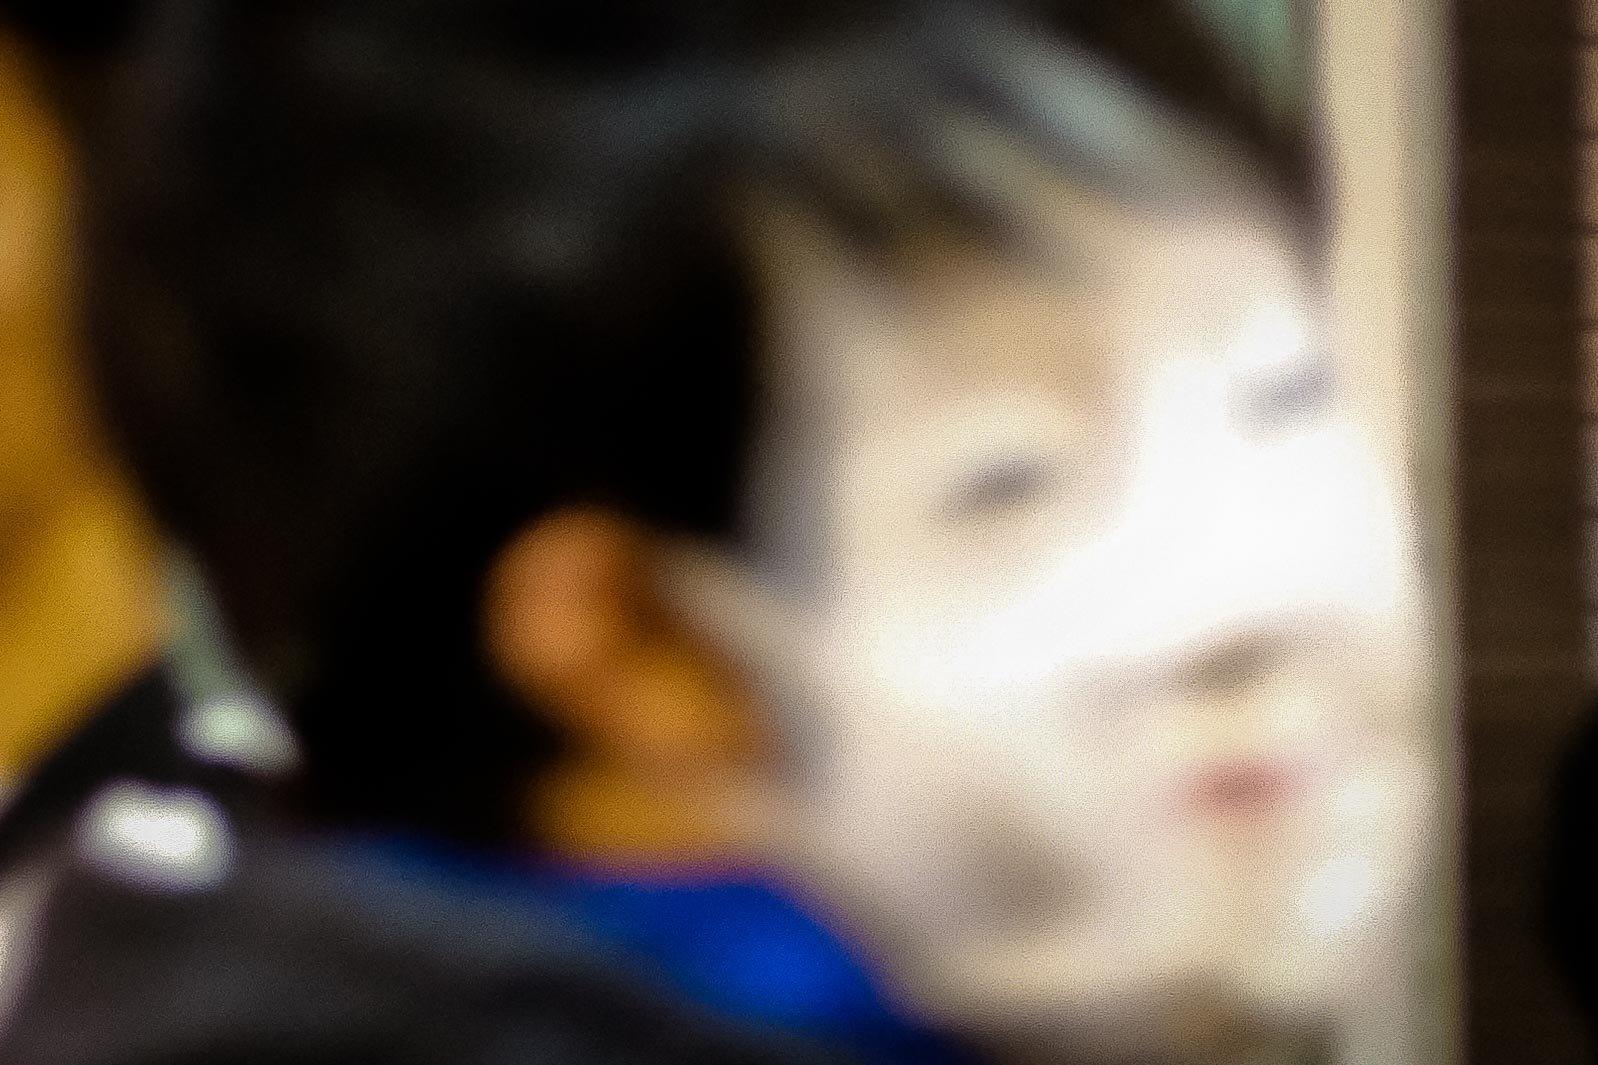 ShibuyaTimeWebsite-15.jpg